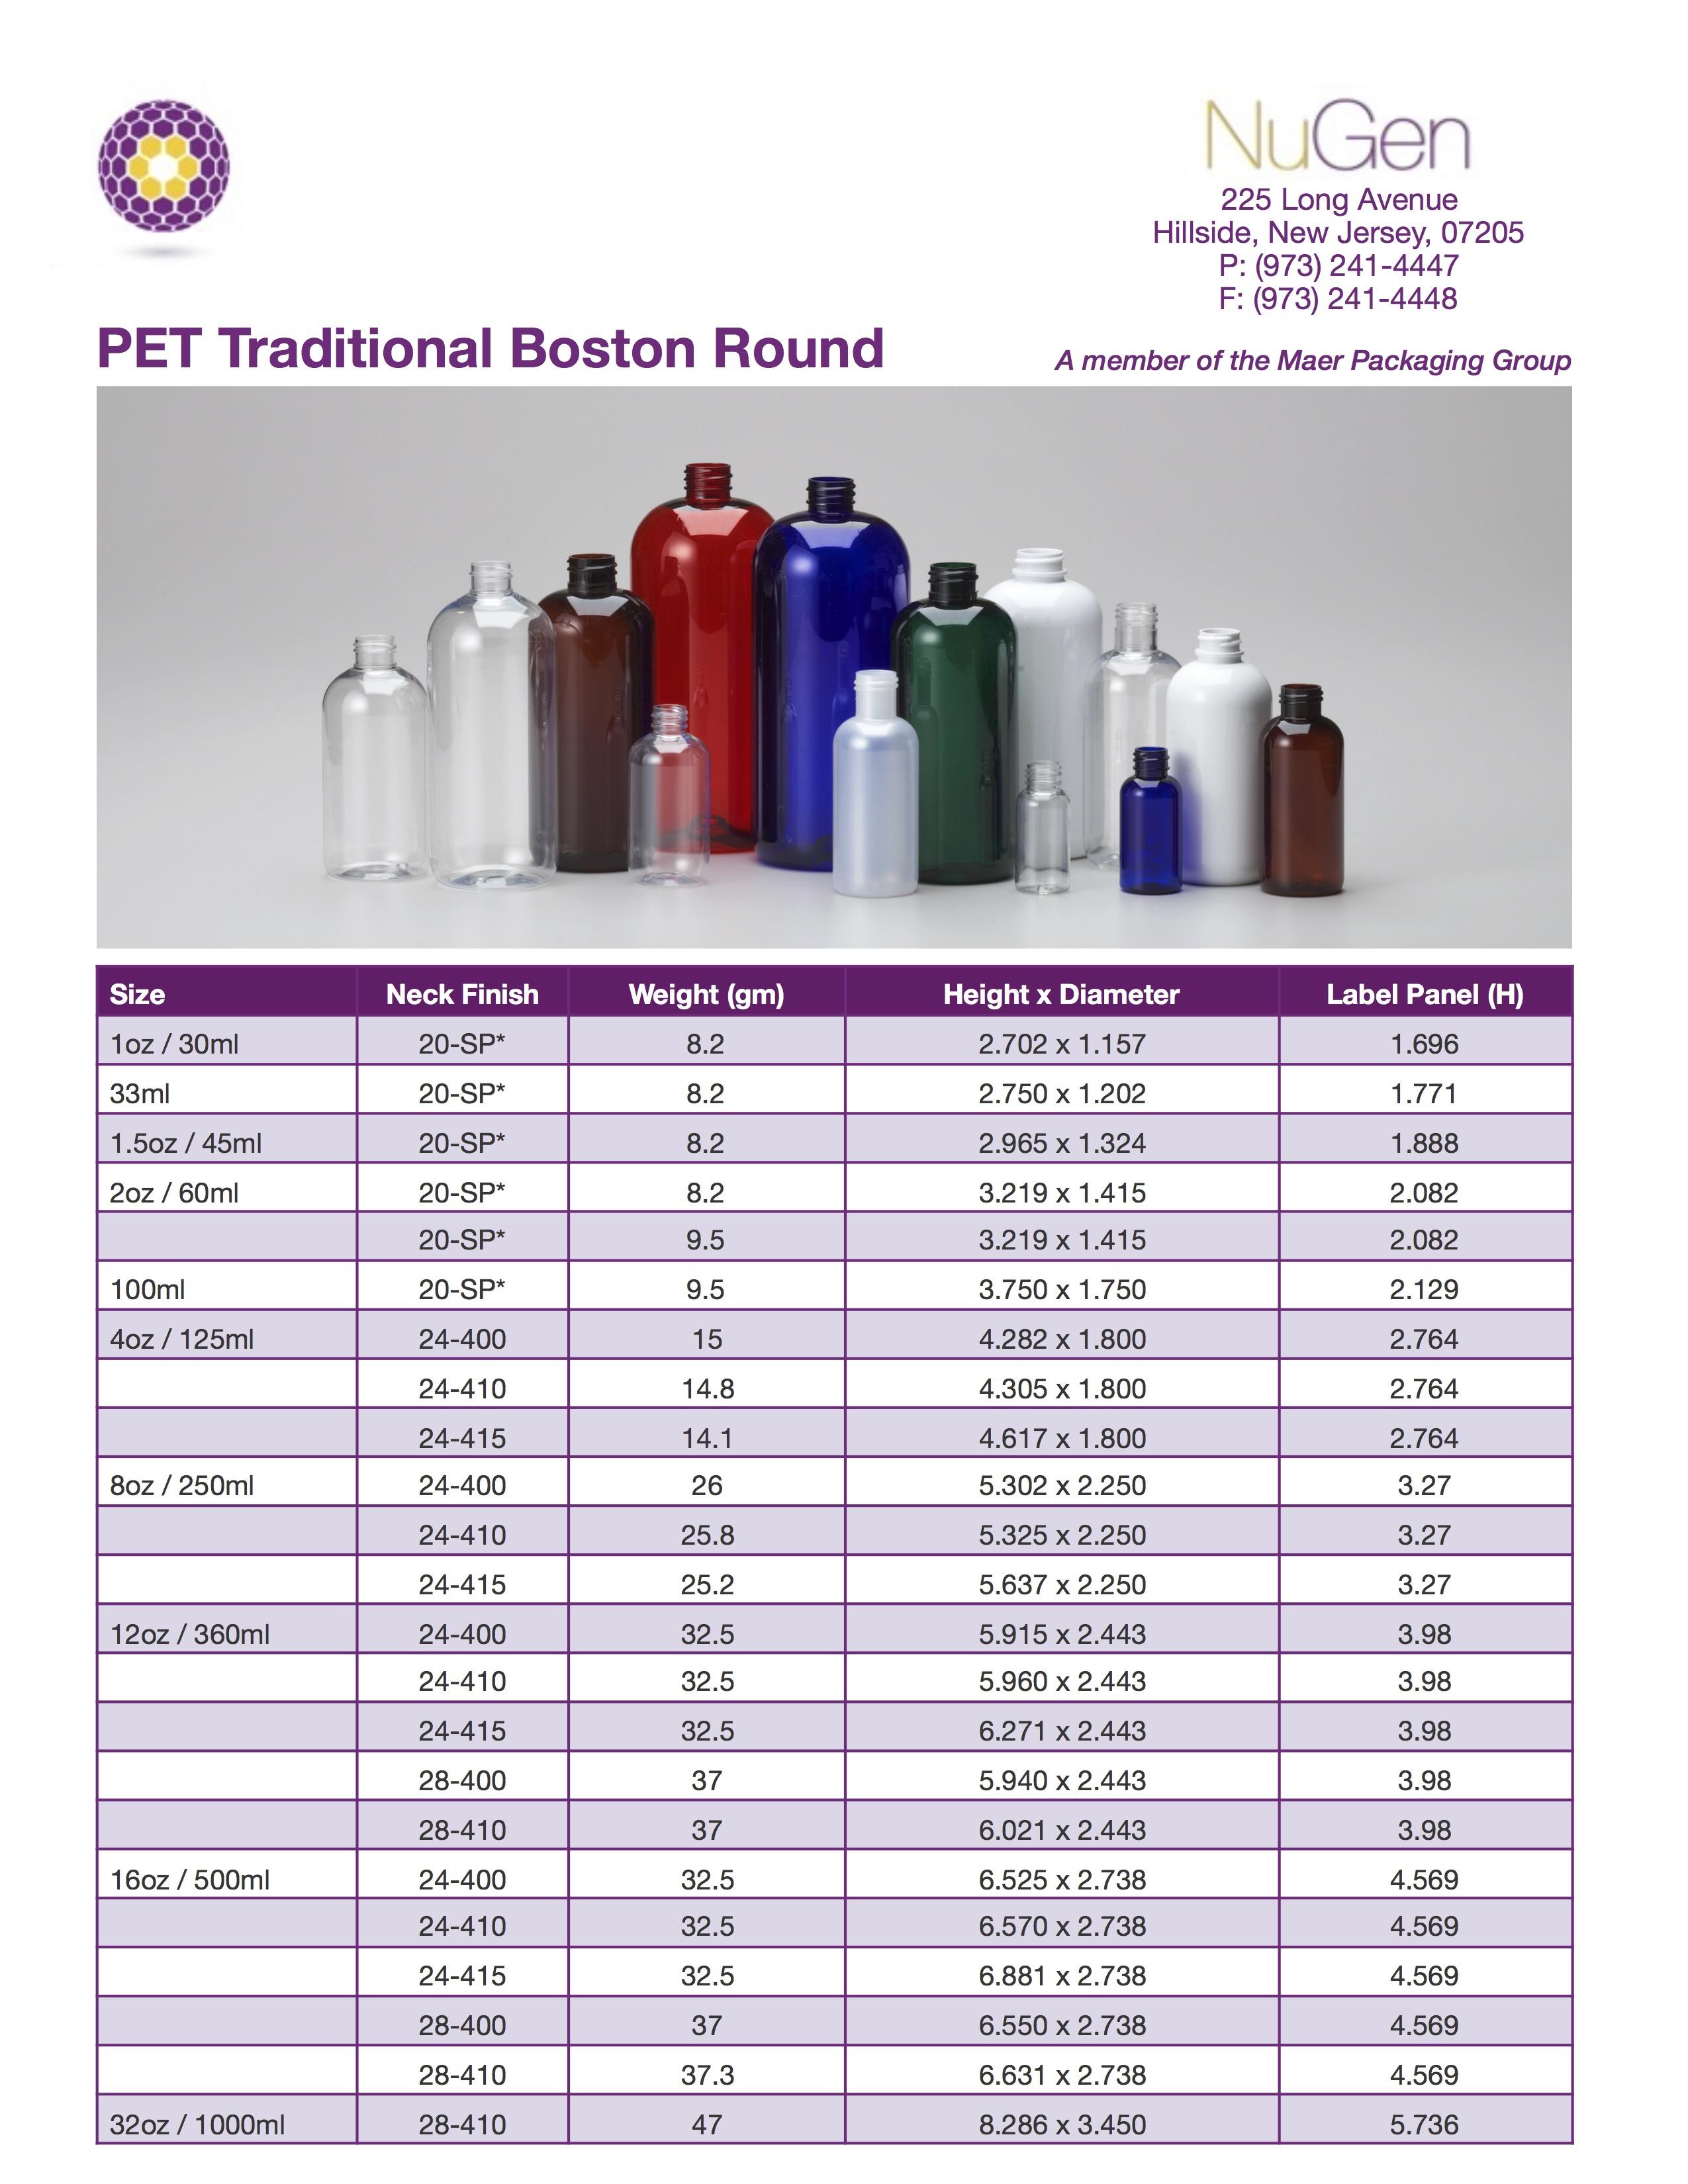 NUGEN_PET_Traditional_Boston_Round-12-2-2015